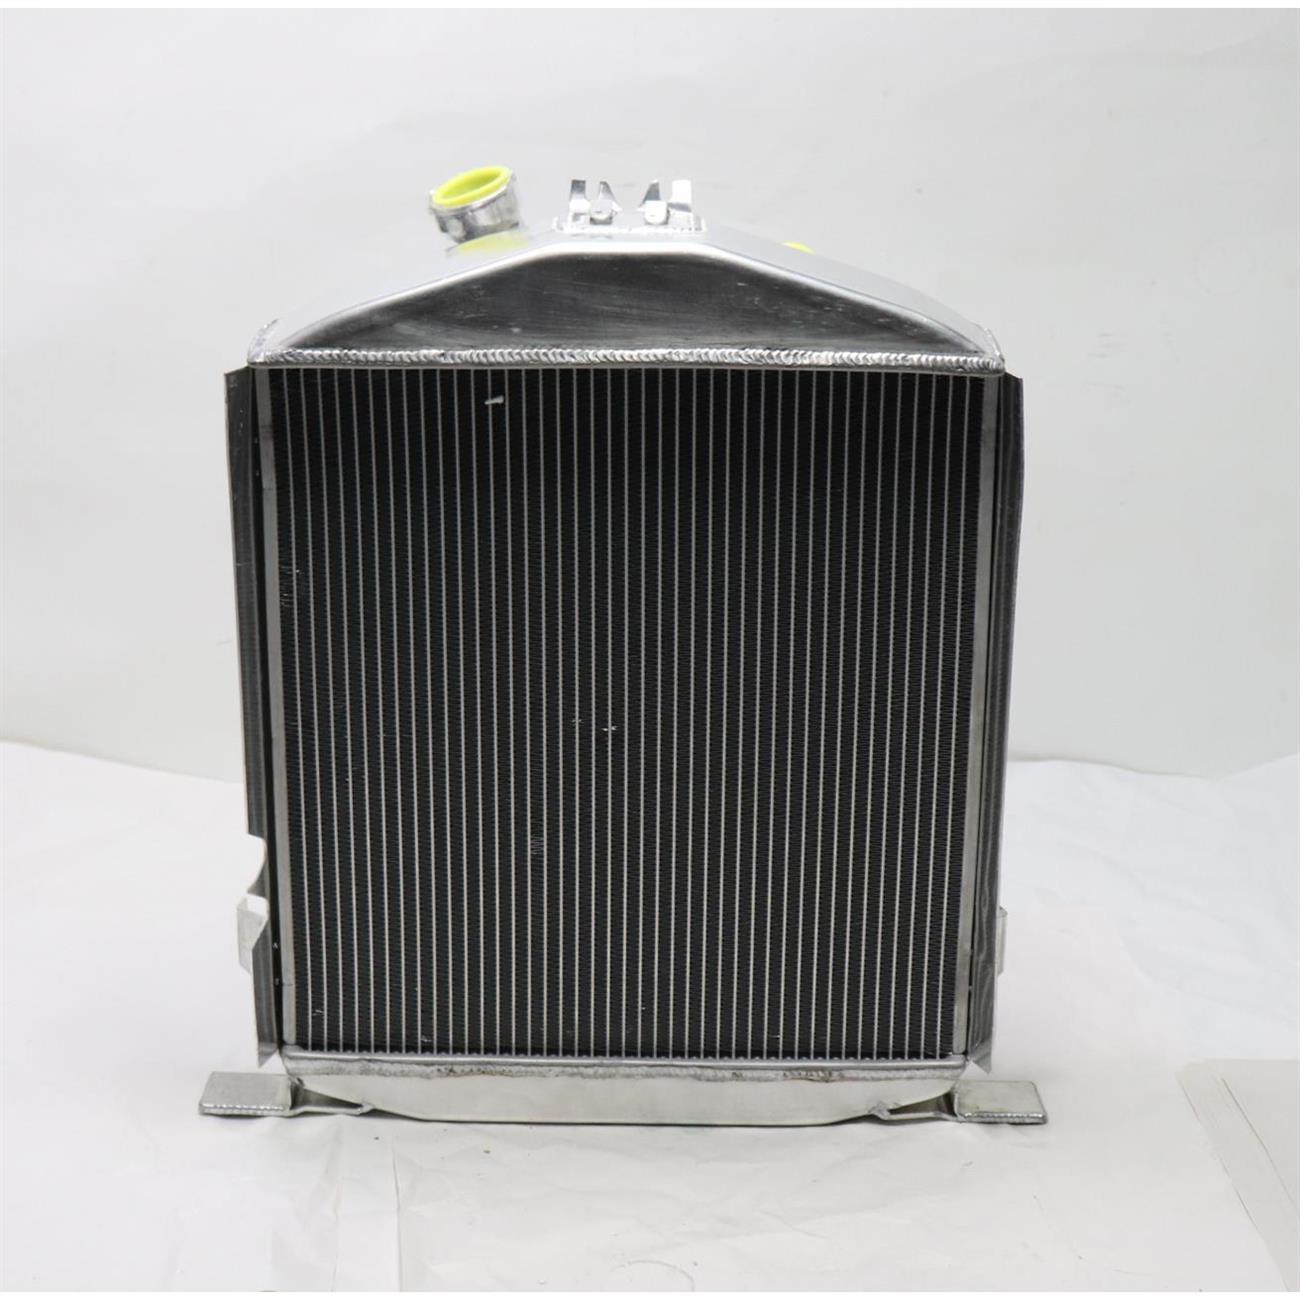 ALLOYWORKS 4 Row Core Aluminum Radiator For 1932 Ford HI-BOY Hot Rod Chevy V8 Engine